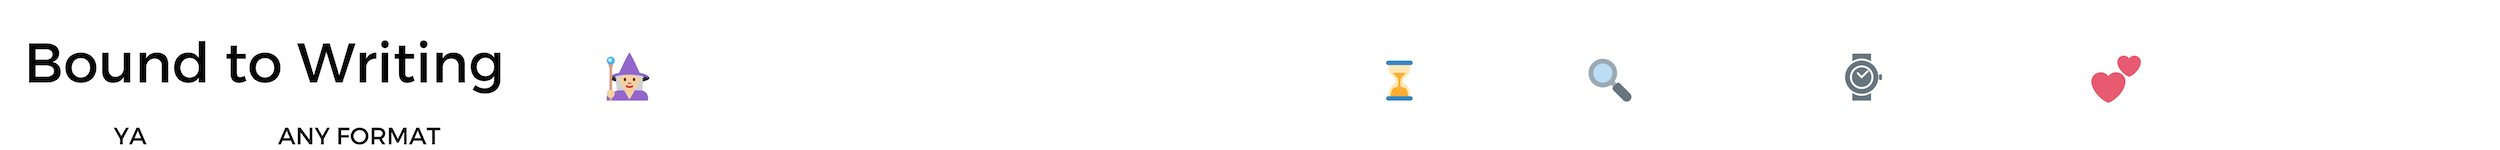 BOOK BLOG COMMUNITY _ BANNER + PROFILES [2500 x 150] (9).jpg